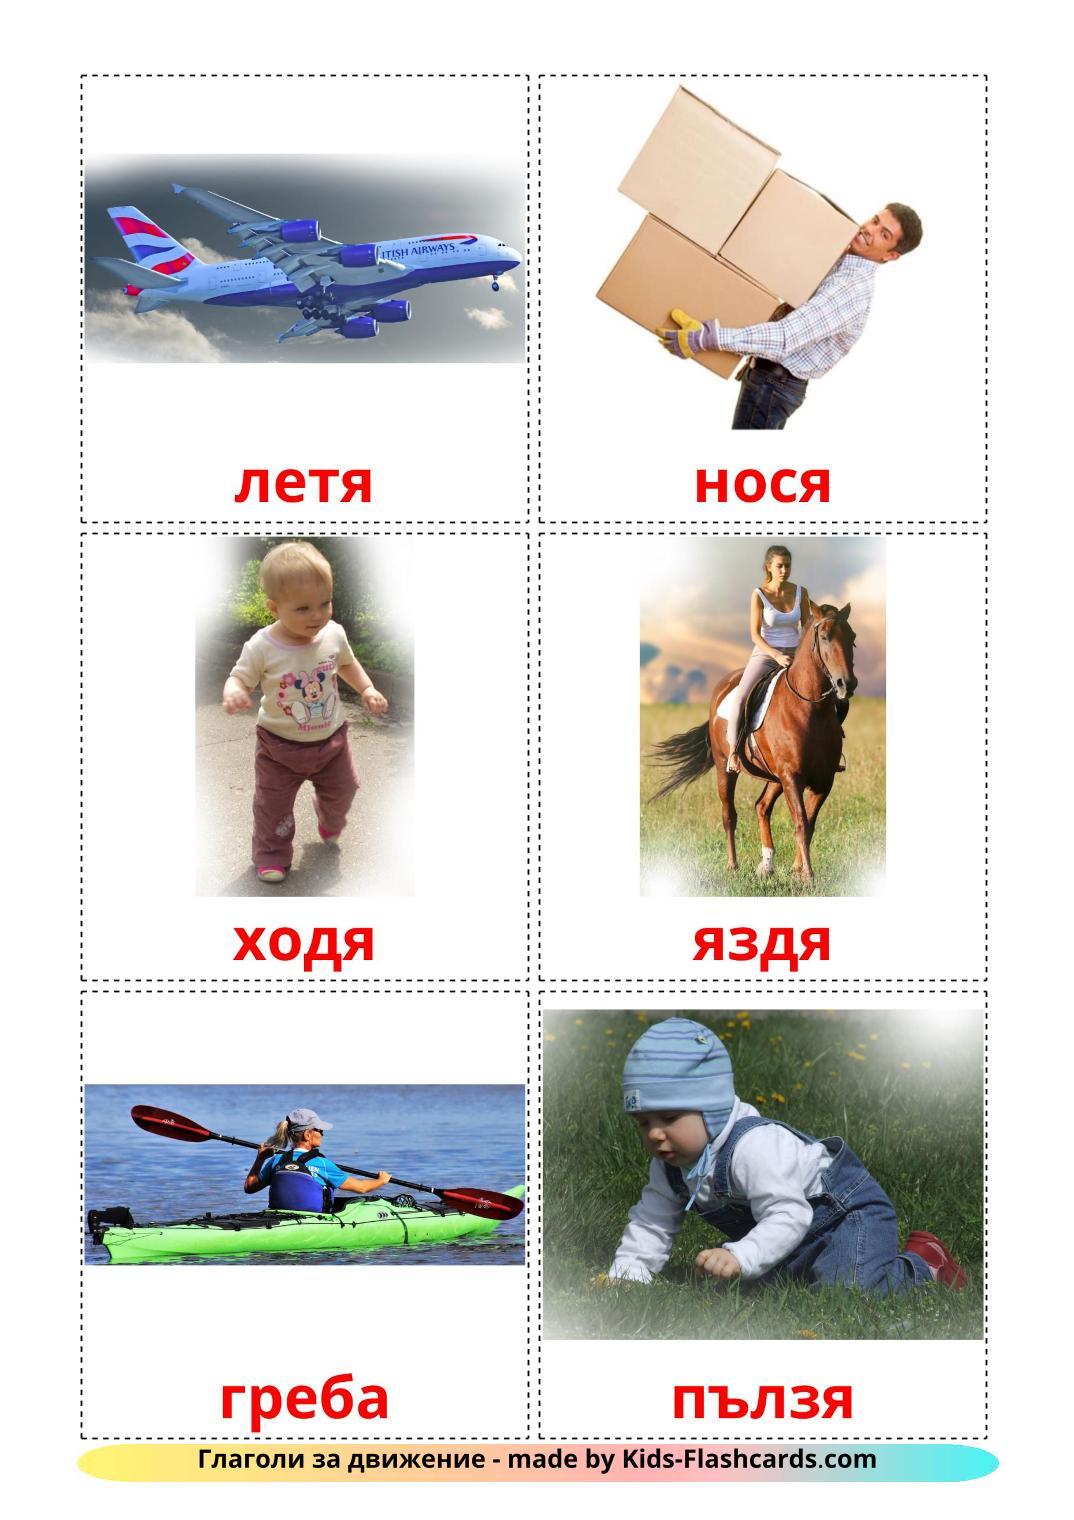 Movement verbs - 22 Free Printable bulgarian Flashcards